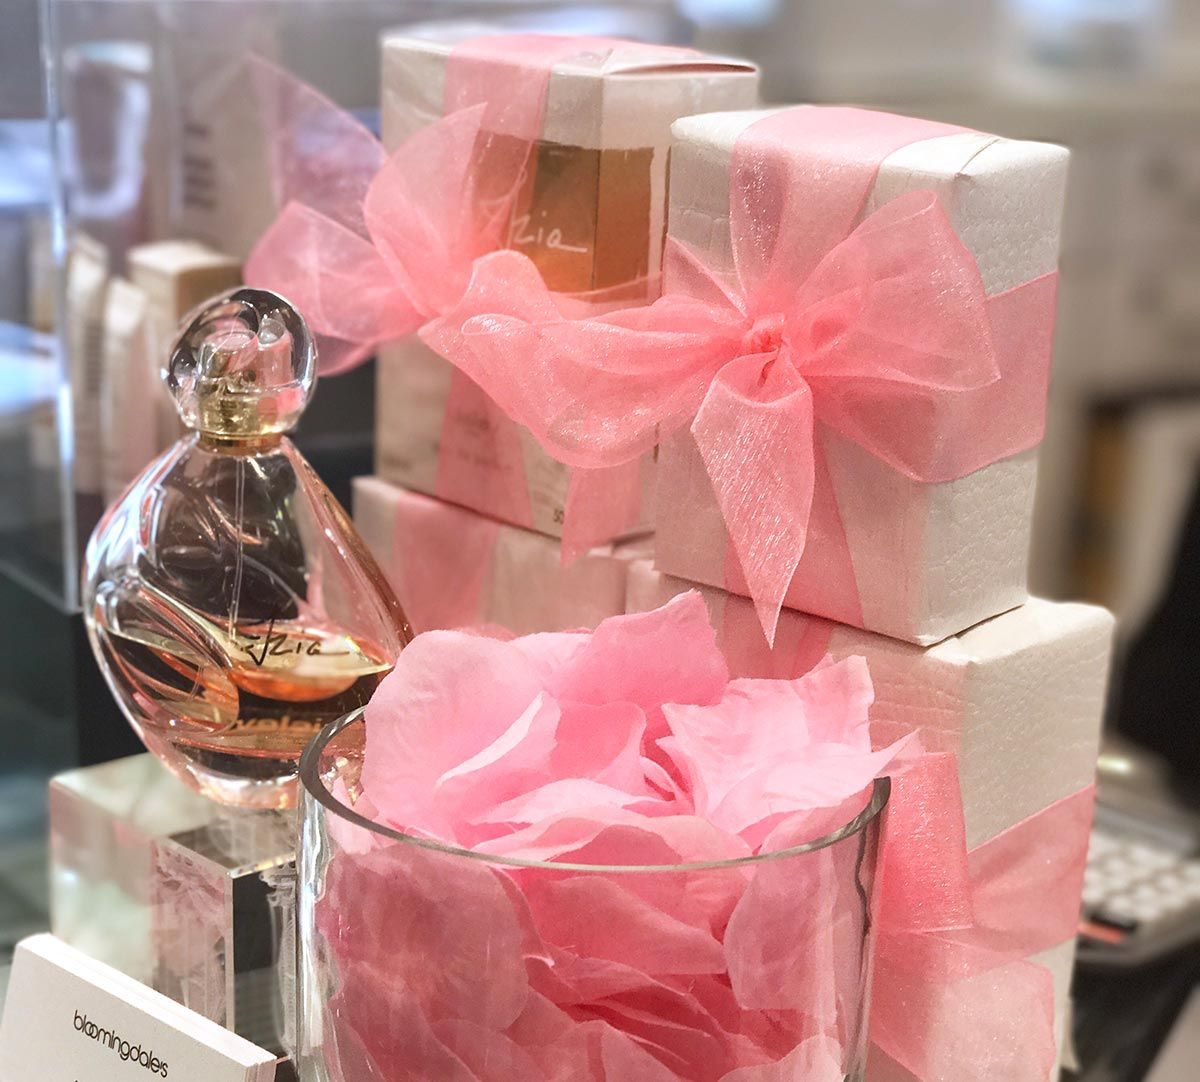 izia sisley in store | Pink | Pinterest | Rose